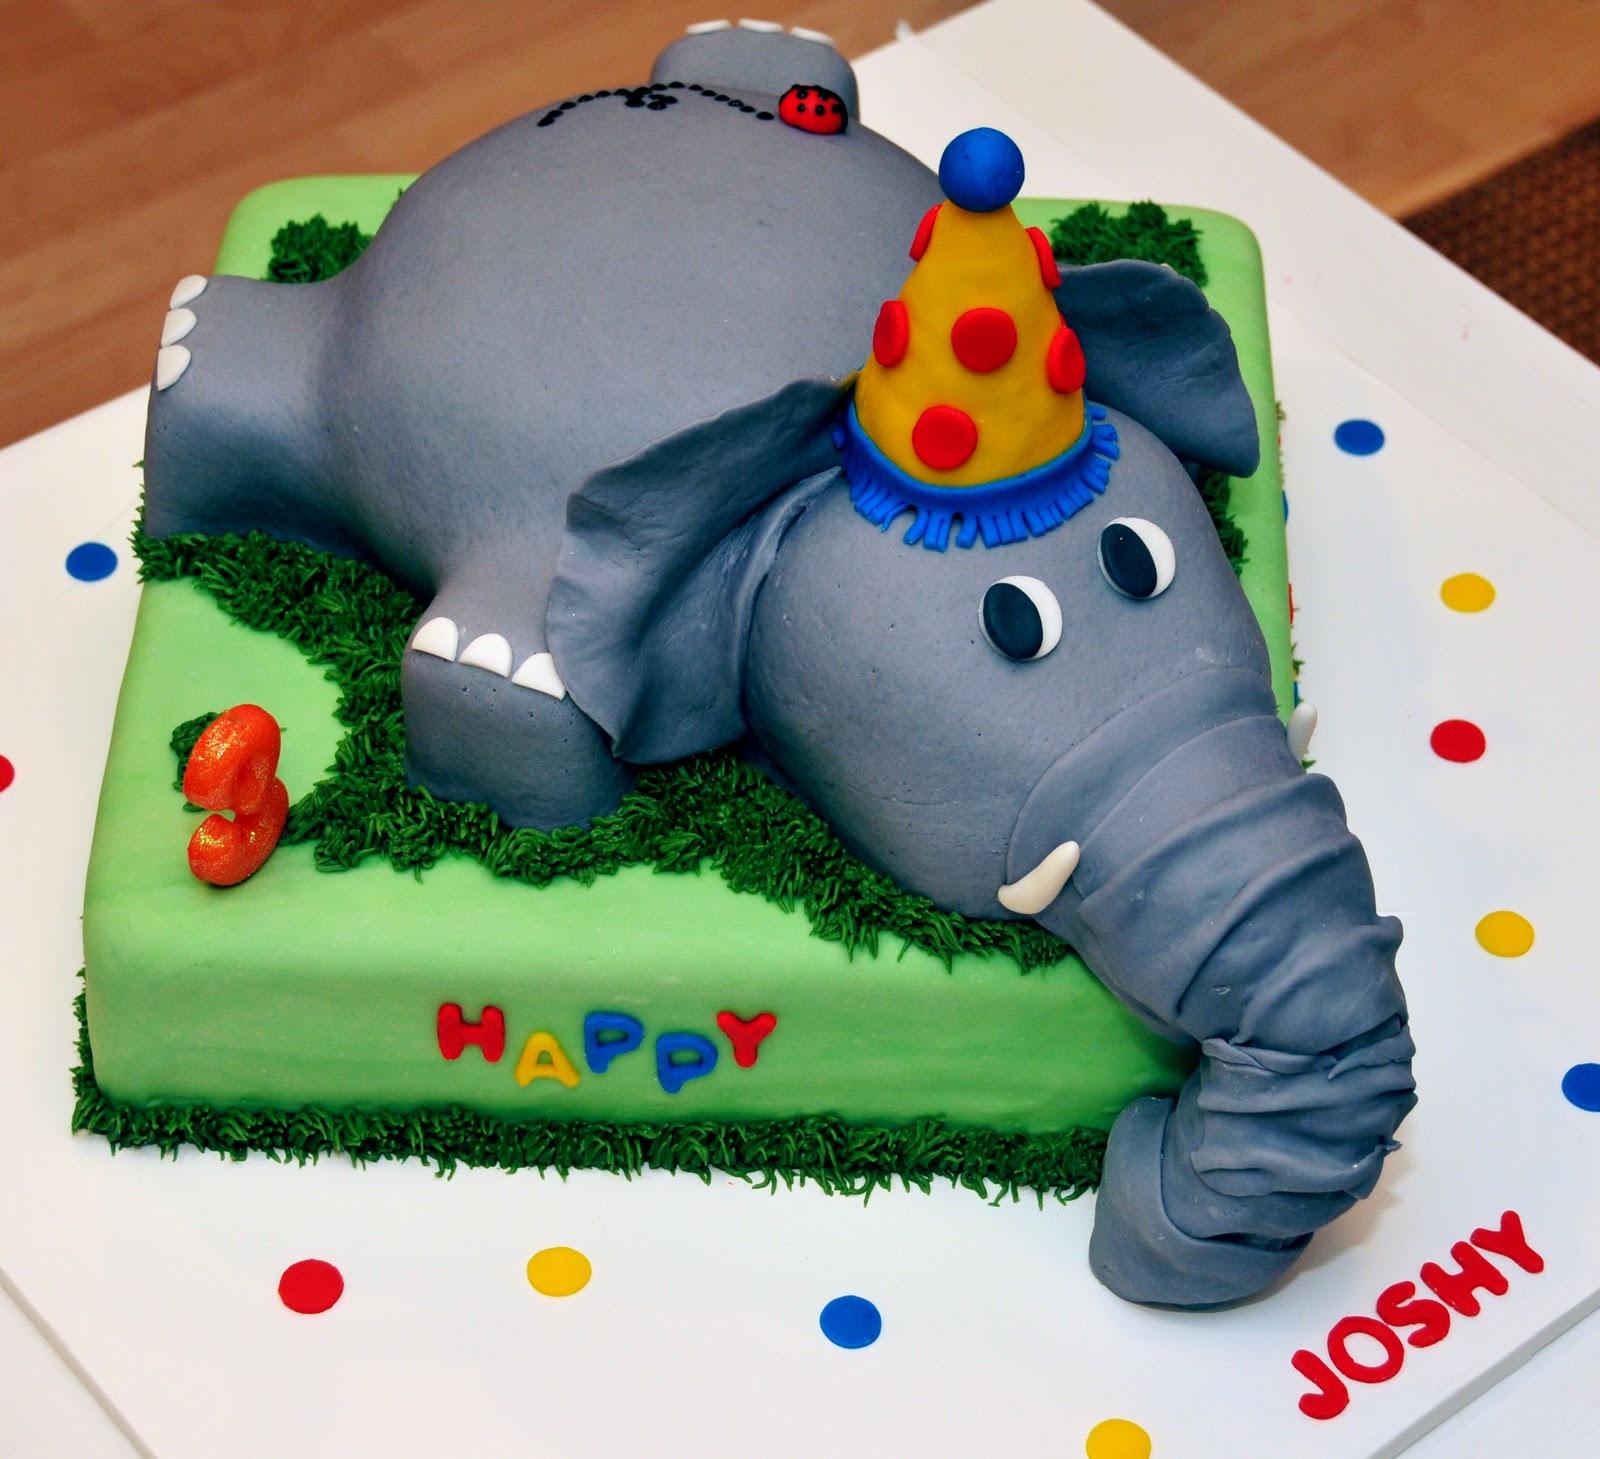 Swell 12 Small Elephant Birthday Cakes Photo Elephant Birthday Cake Funny Birthday Cards Online Overcheapnameinfo